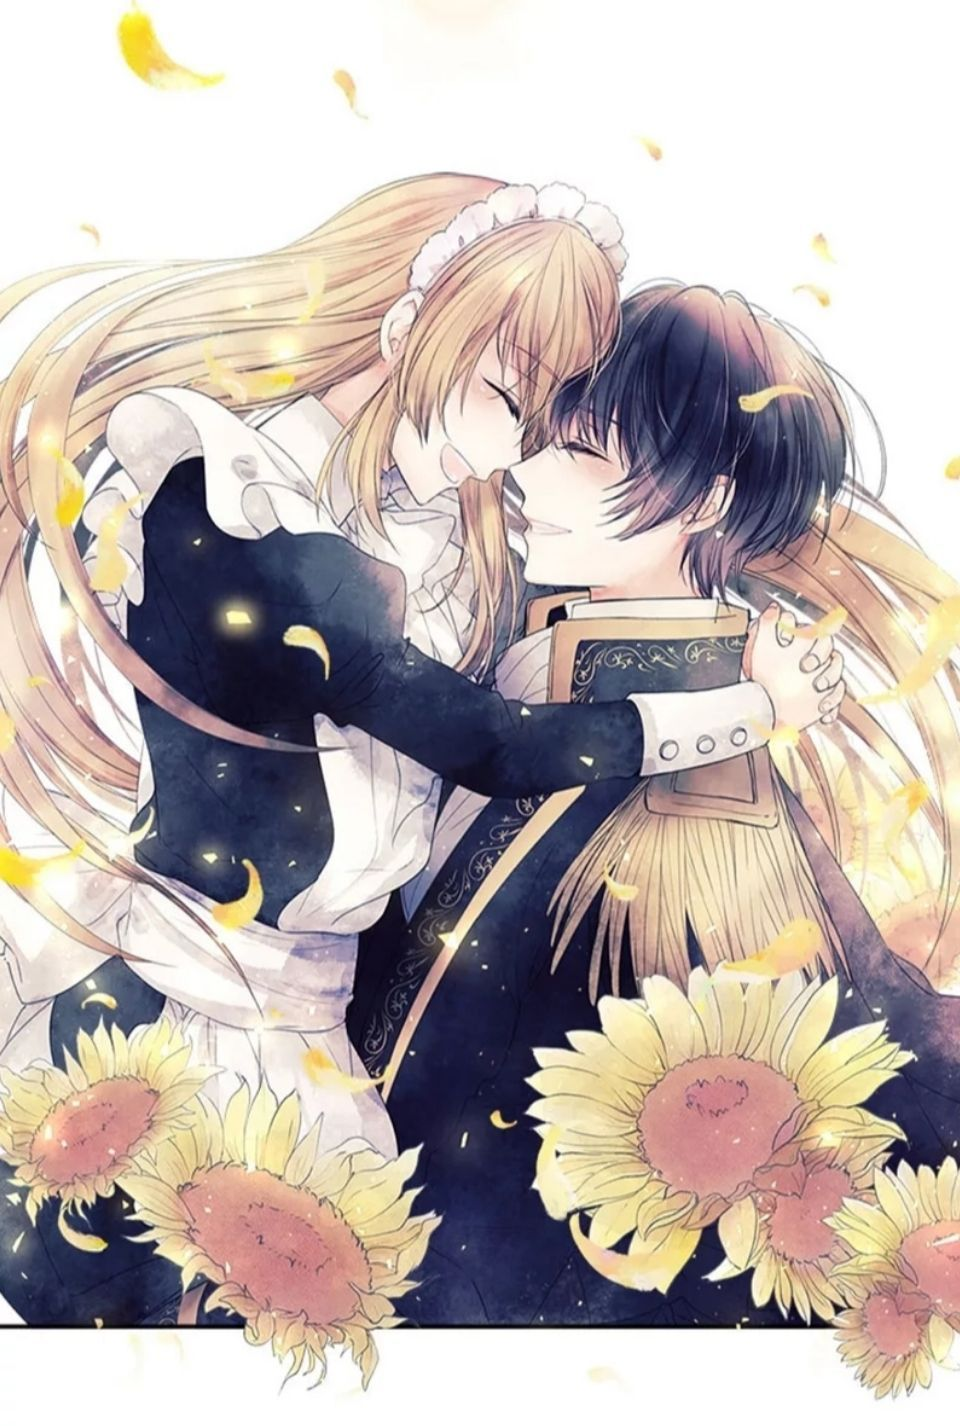 Aku Menjadi Pelayan Duke Season 1 Di 2020 Seni Anime Gambar Pasangan Anime Pasangan Anime Lucu